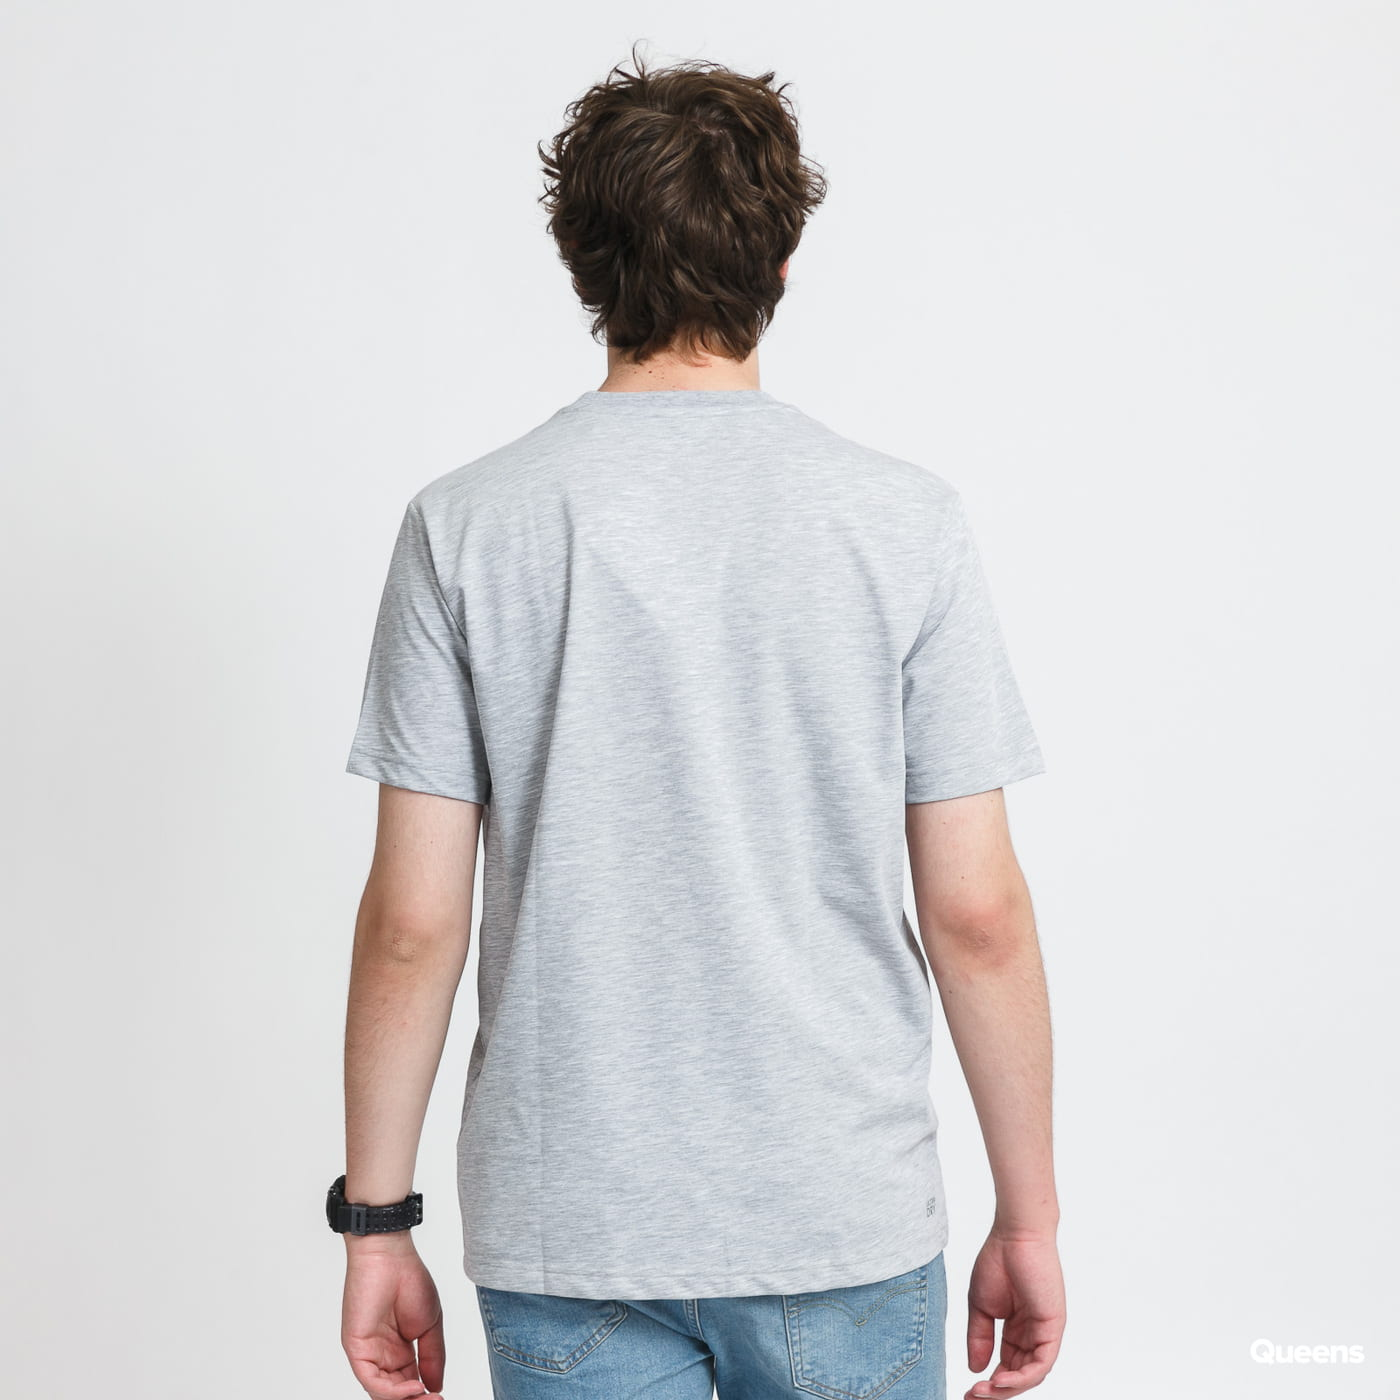 LACOSTE Men's Sport 3D Print Tee melange gray